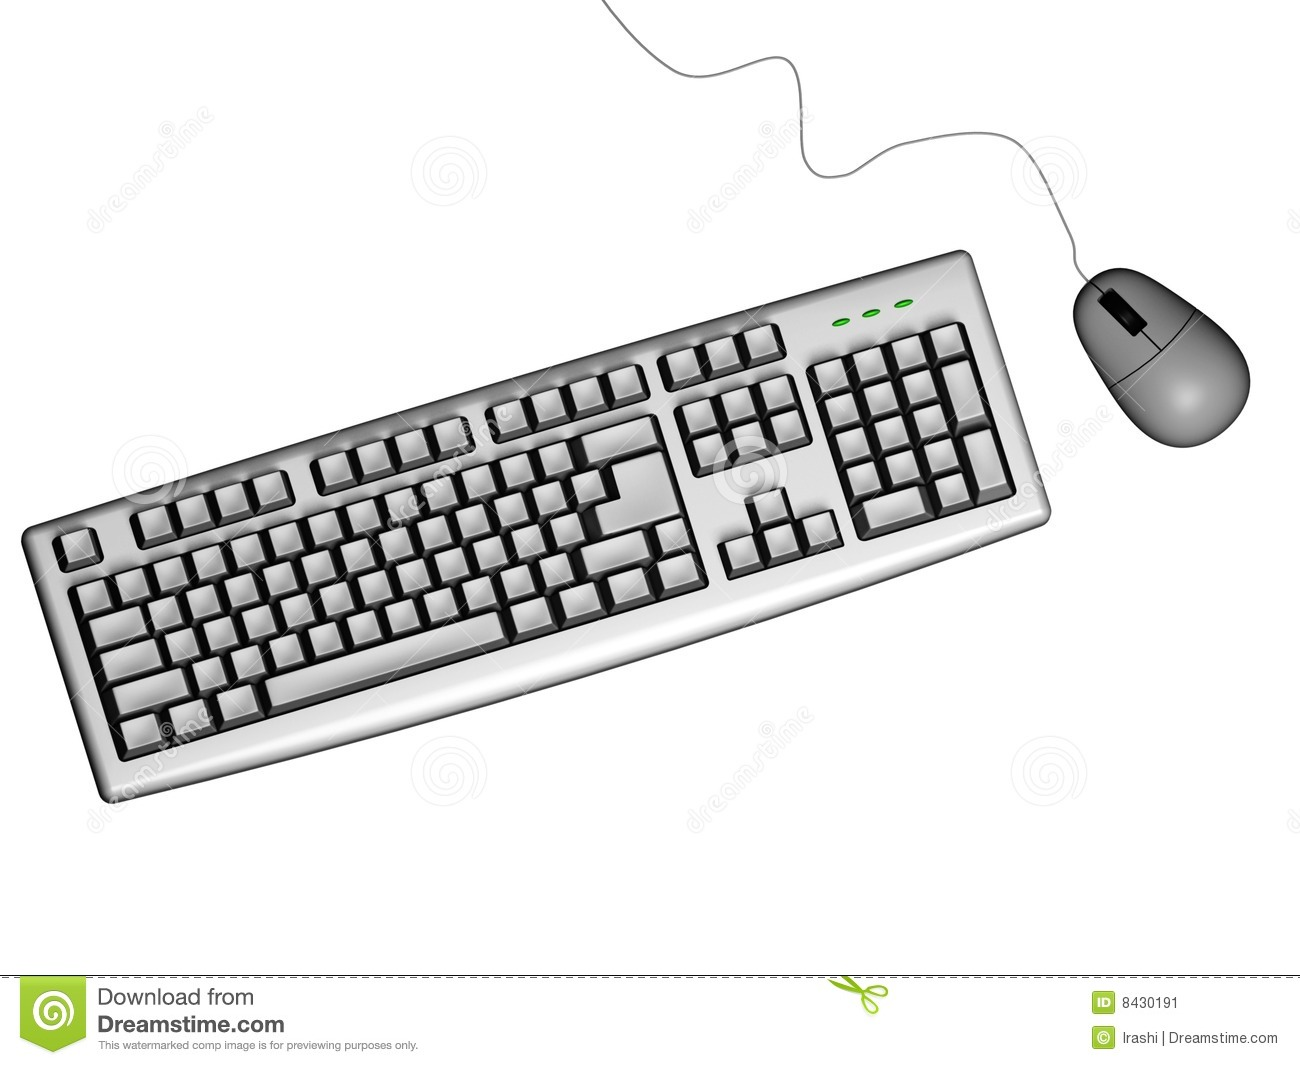 Computer keyboard clipart black and white jpg black and white stock Keyboard and mouse clipart black and white - ClipartFest jpg black and white stock